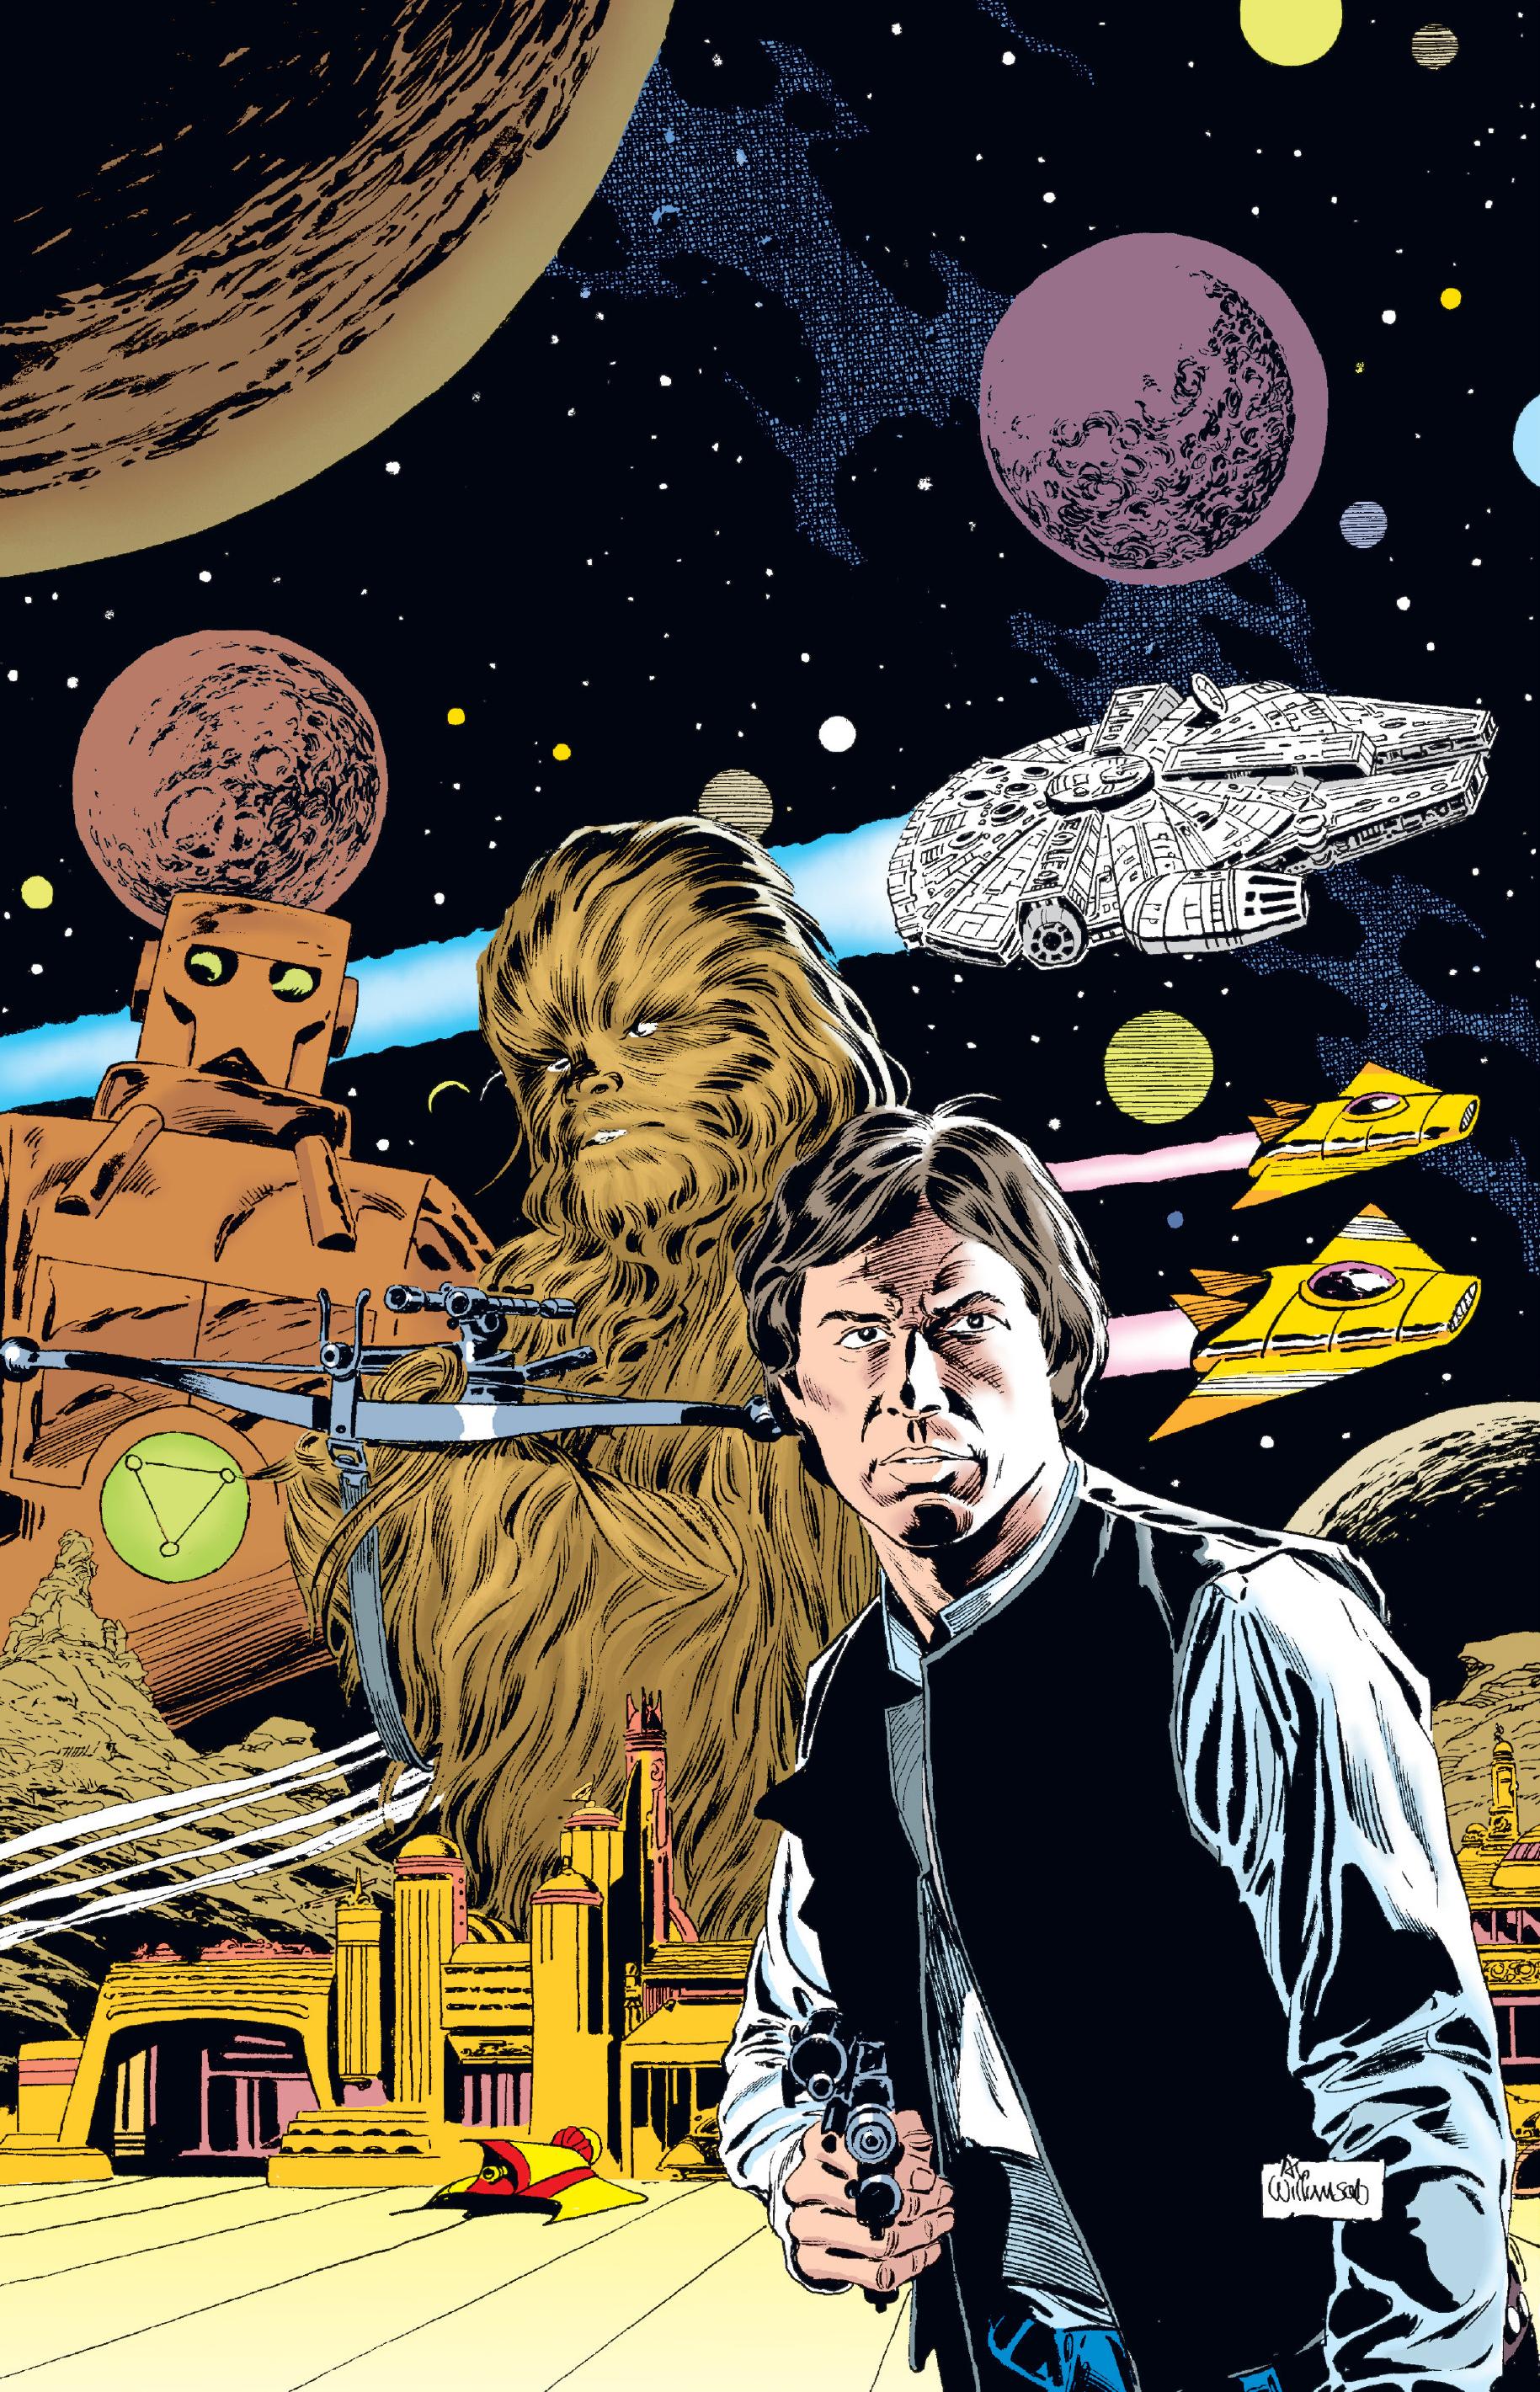 Han Solo stars end tpb notext.jpg